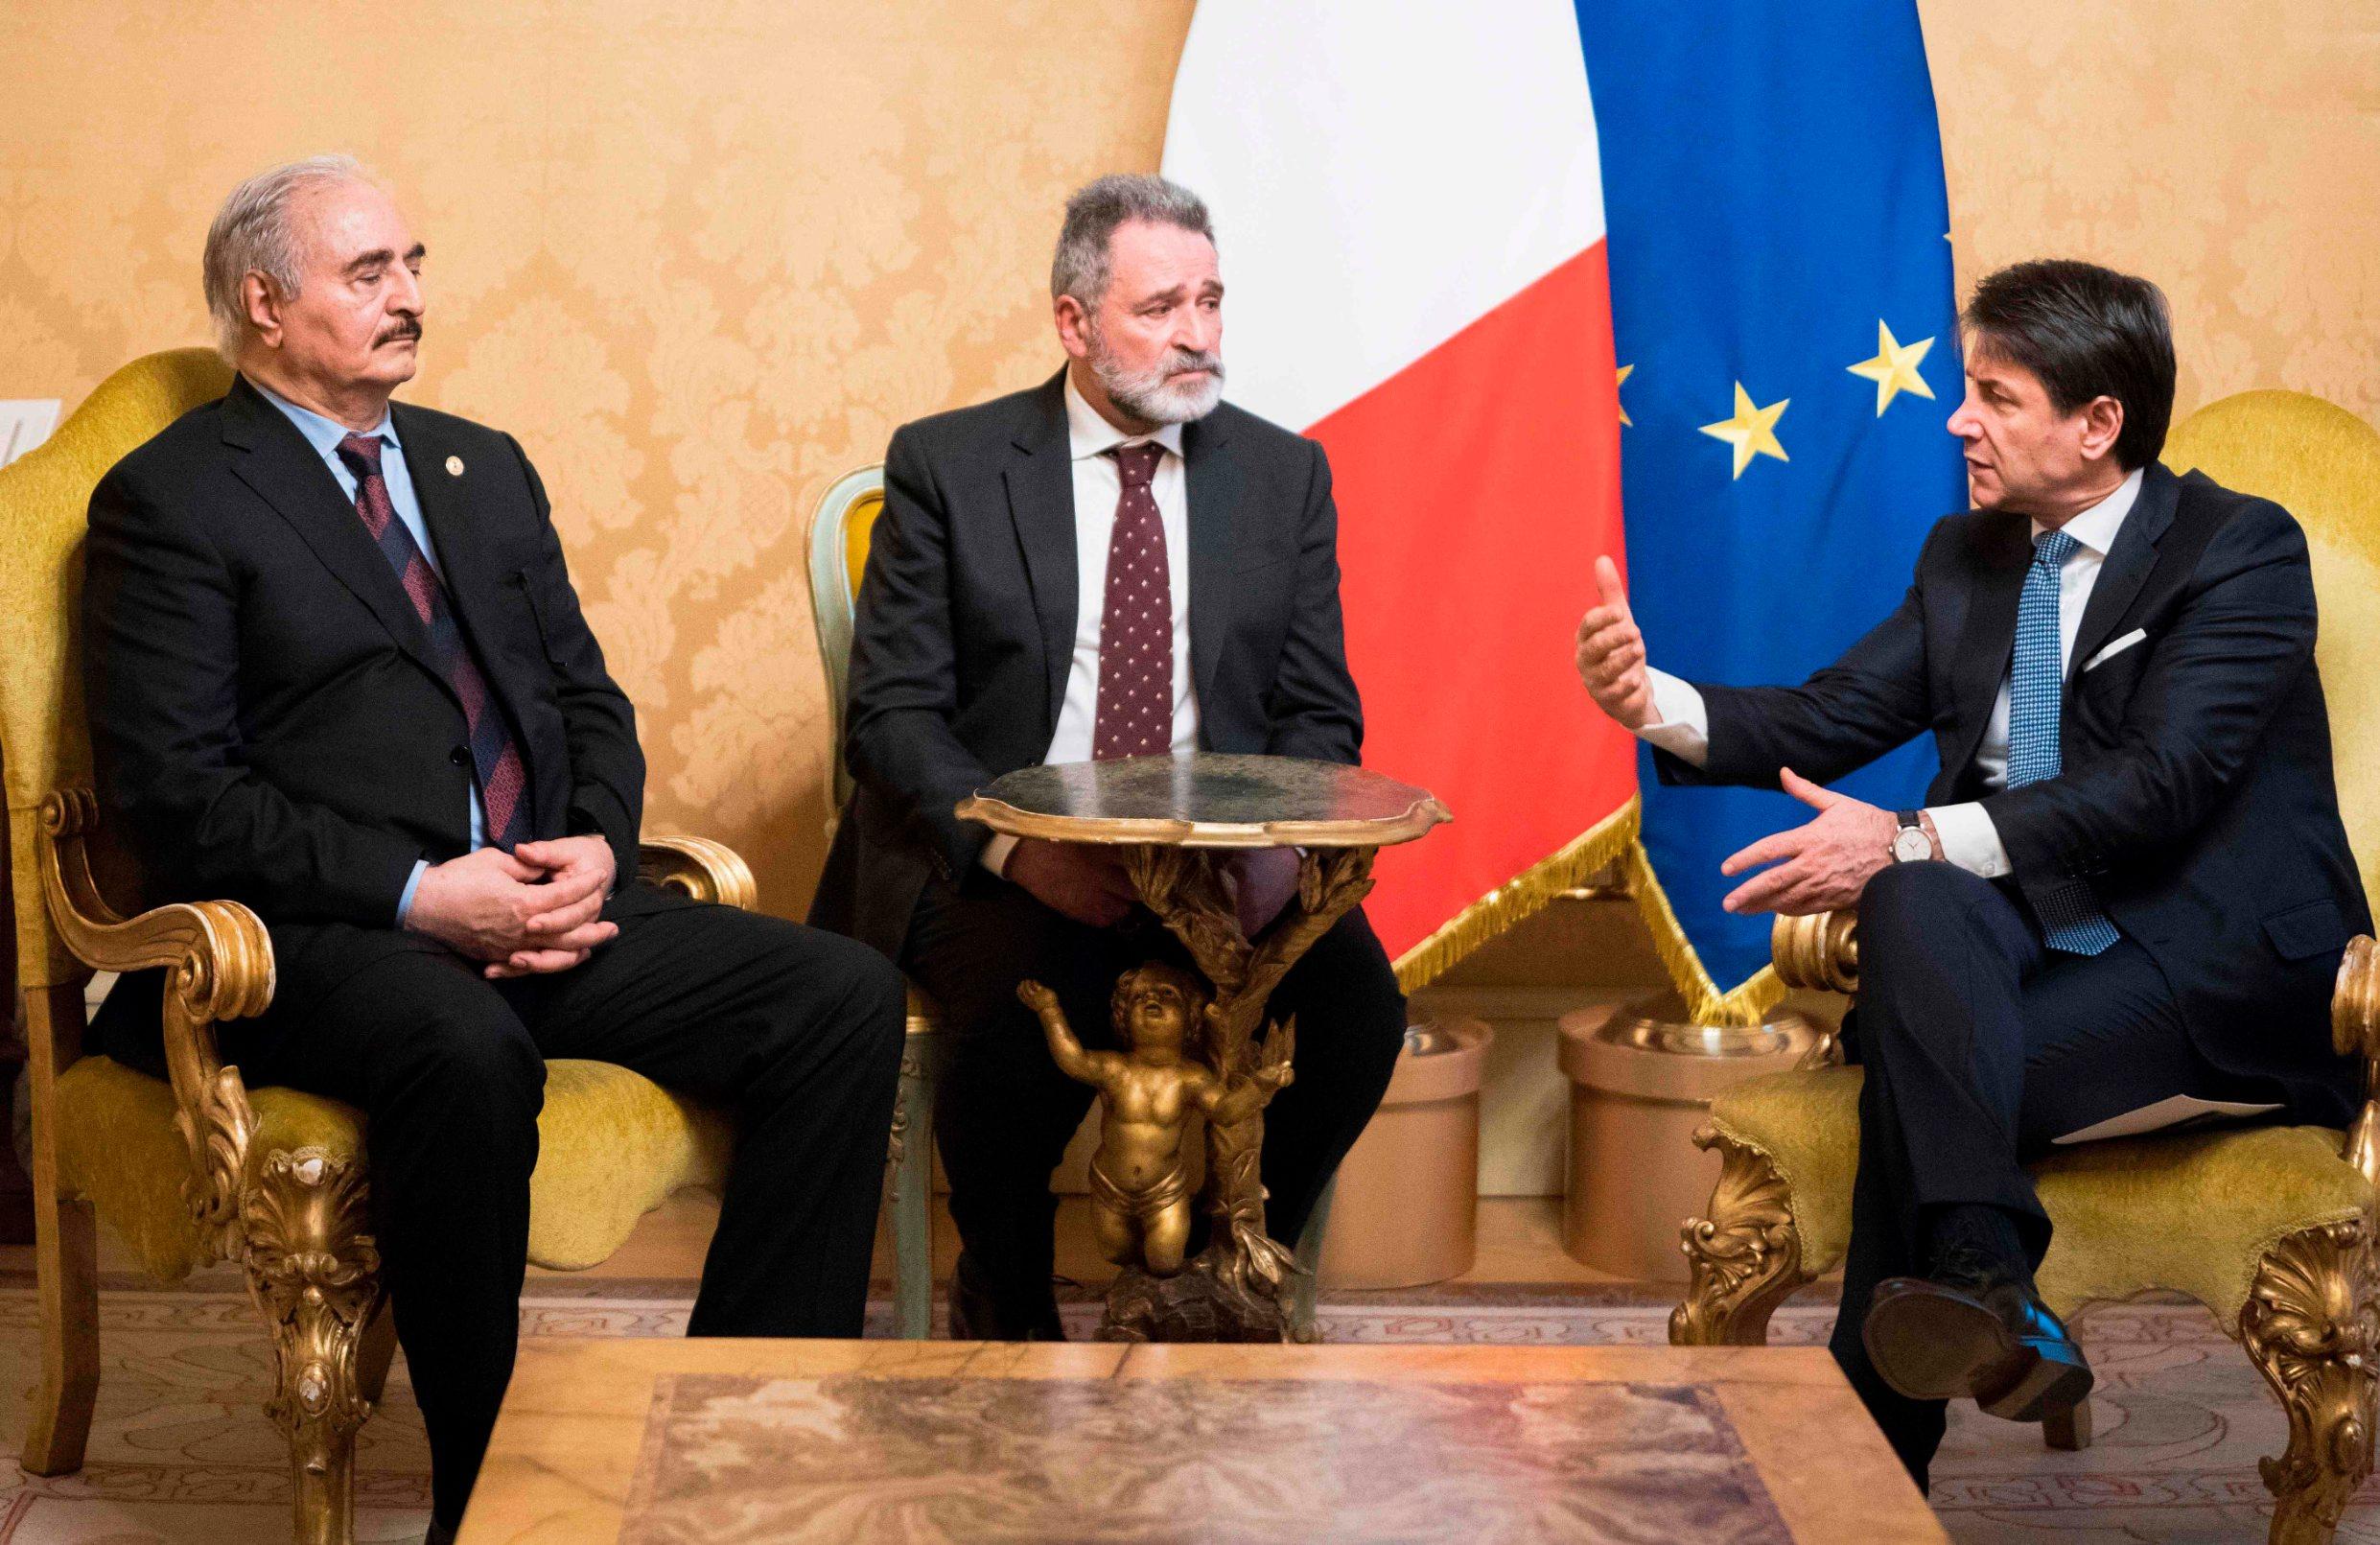 Talijanski premijer Giuseppe Conte (desno) i lider libijske Nacionalne armije maršal Kalifa Haftar